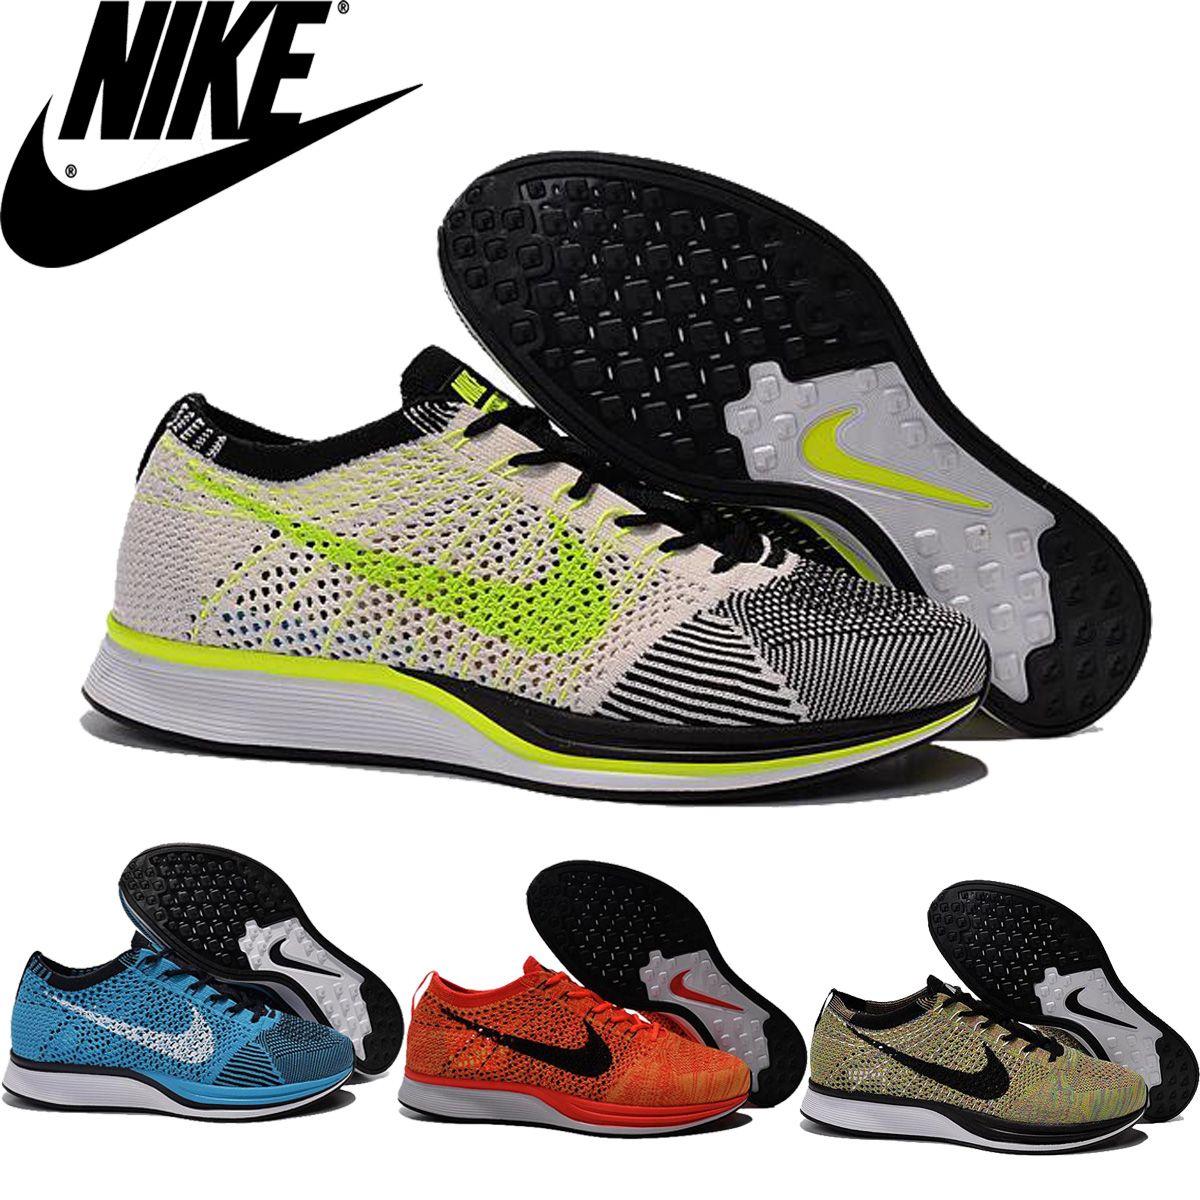 Compre Nike Flyknit Racer Negro Blanco Kanye West Oreo Hombres De Los  Zapatos Corrientes, Nike Racer Blue Lagoon Negro Gecko 526628 401 Hombres  ...